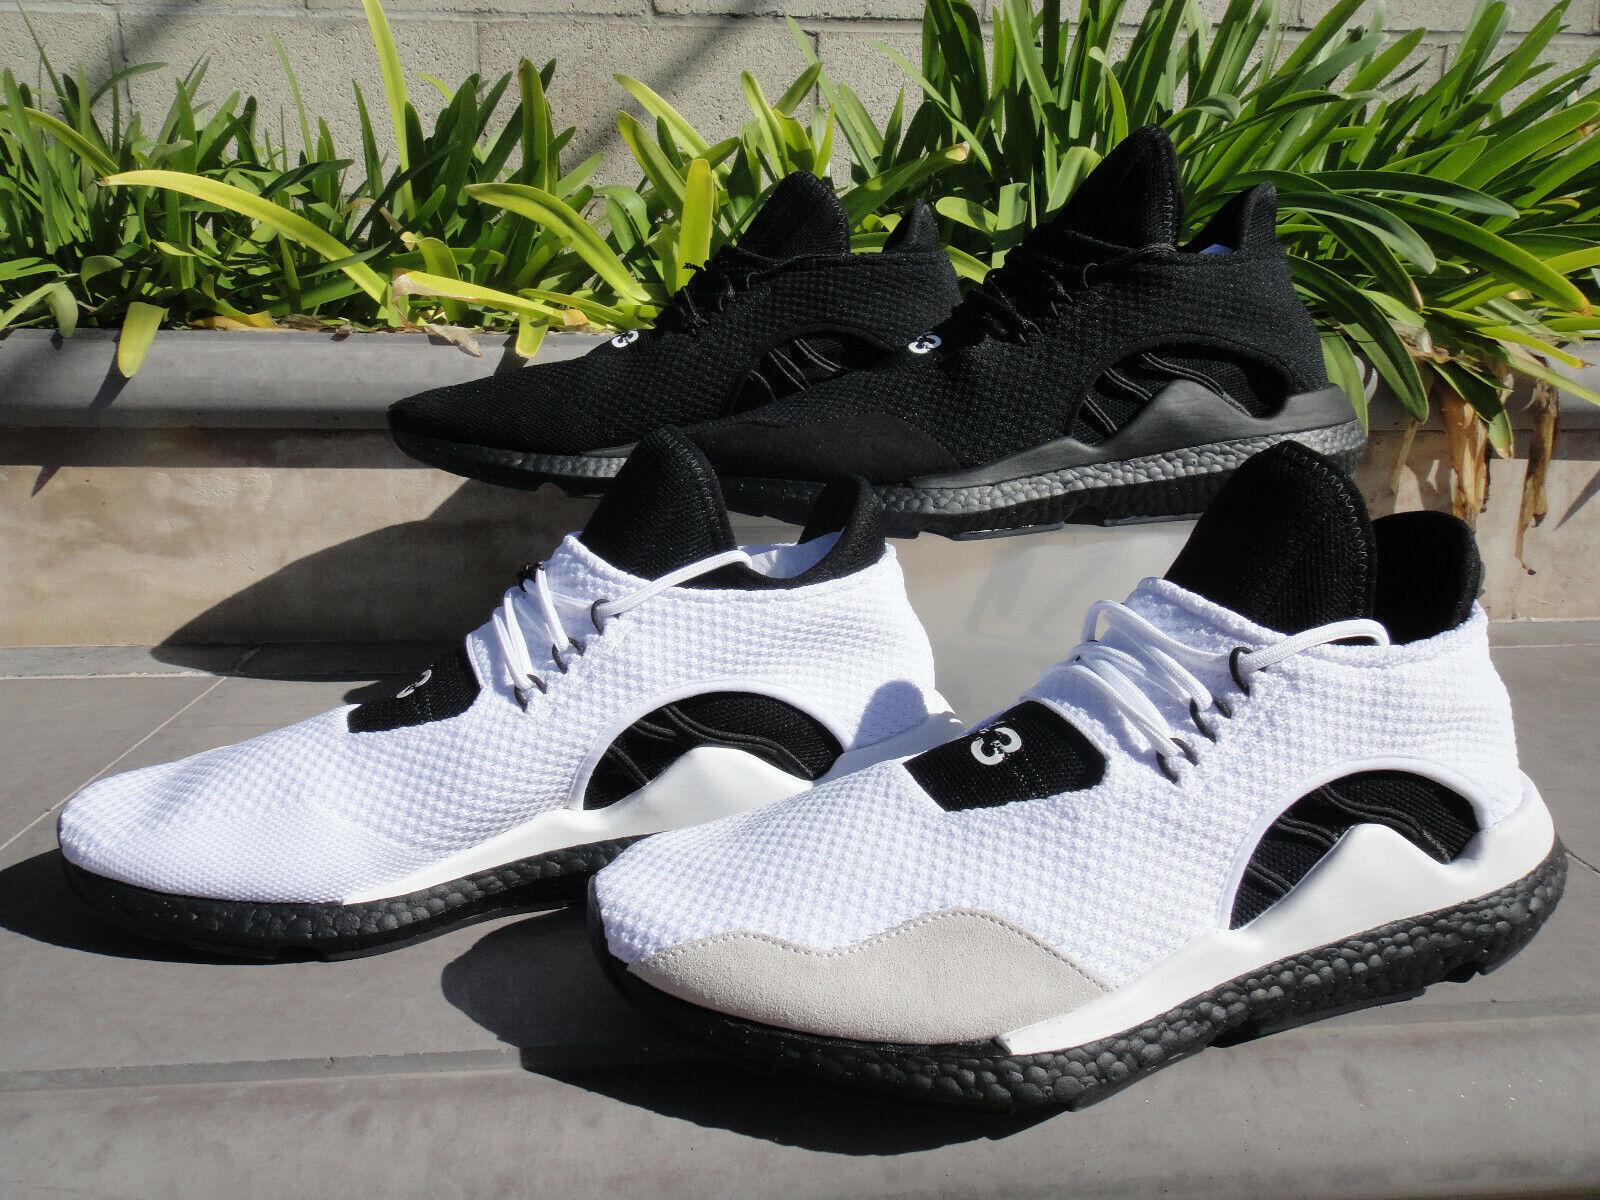 Adidas x Y-3 SAIKOU Boost, Sneakers, BC0950 Black or BC0951 White, Pick Size